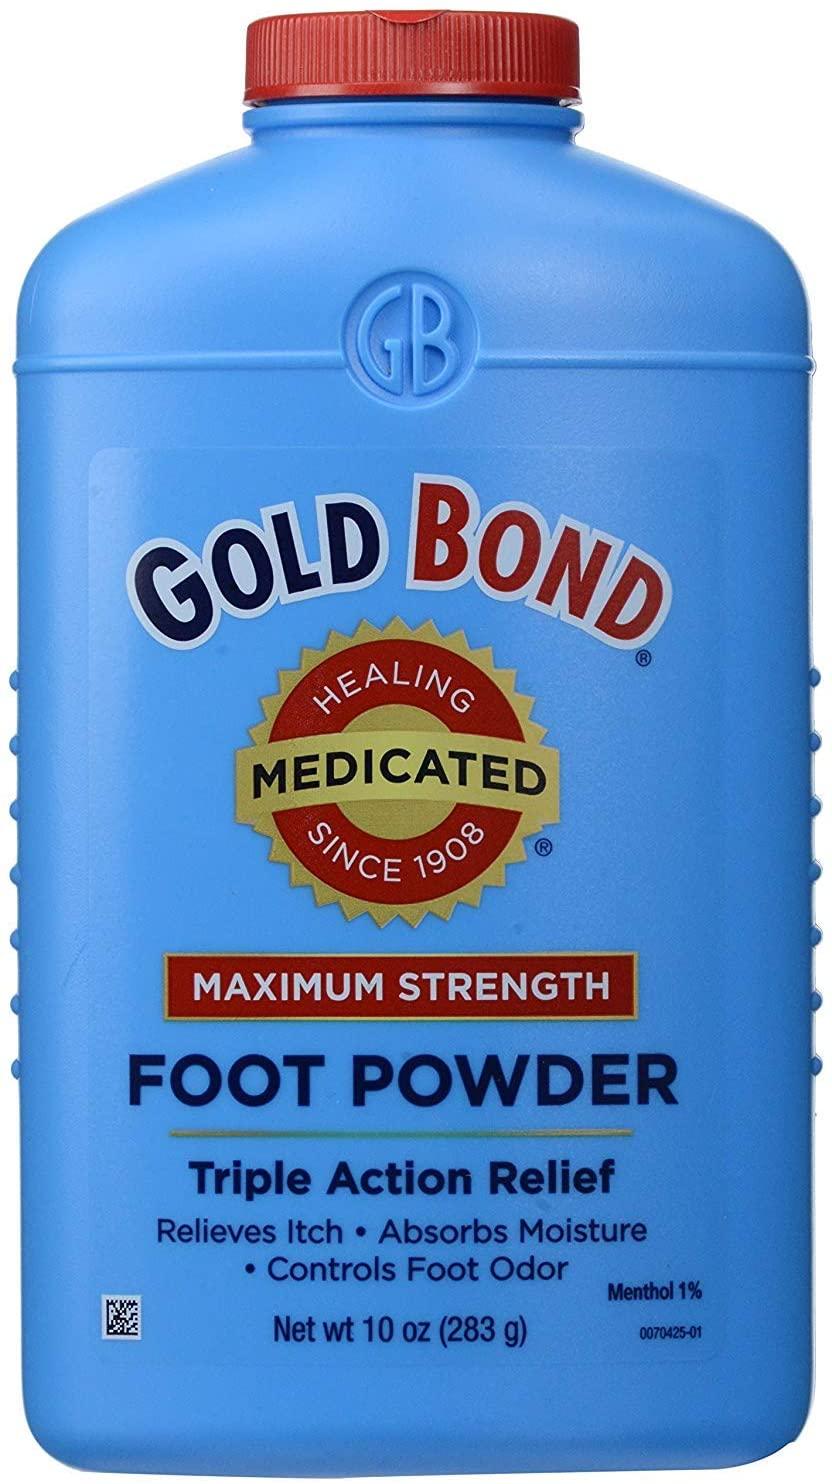 Gold Bond Medicated Foot Powder - 10 Oz by Gold Bond